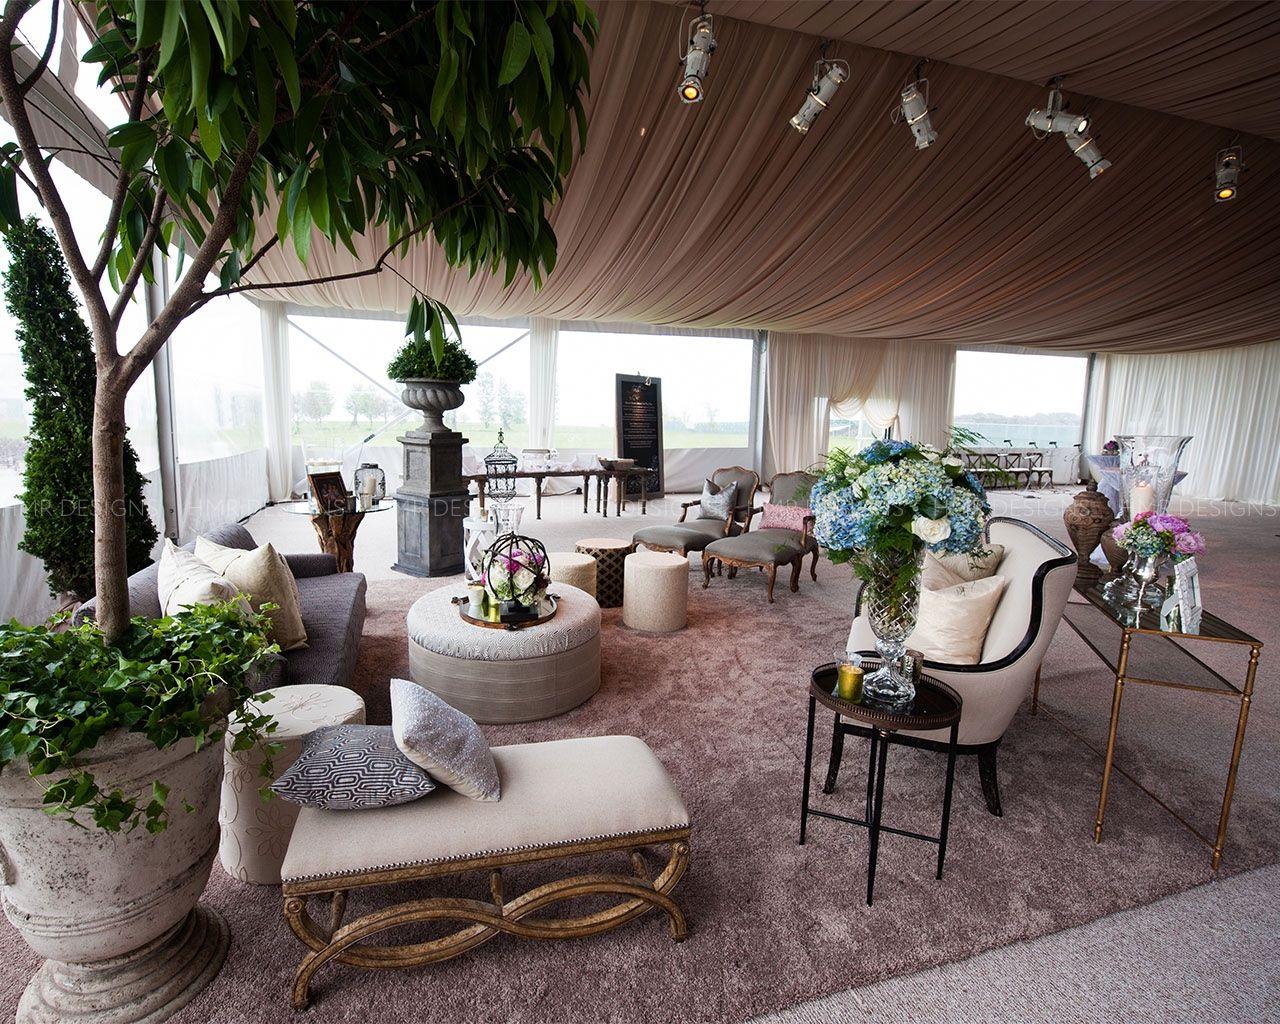 Wedding Rental Furniture Chicago Hmr Designs Wedding Rentals Decor Rental Furniture Wedding Furniture Rental